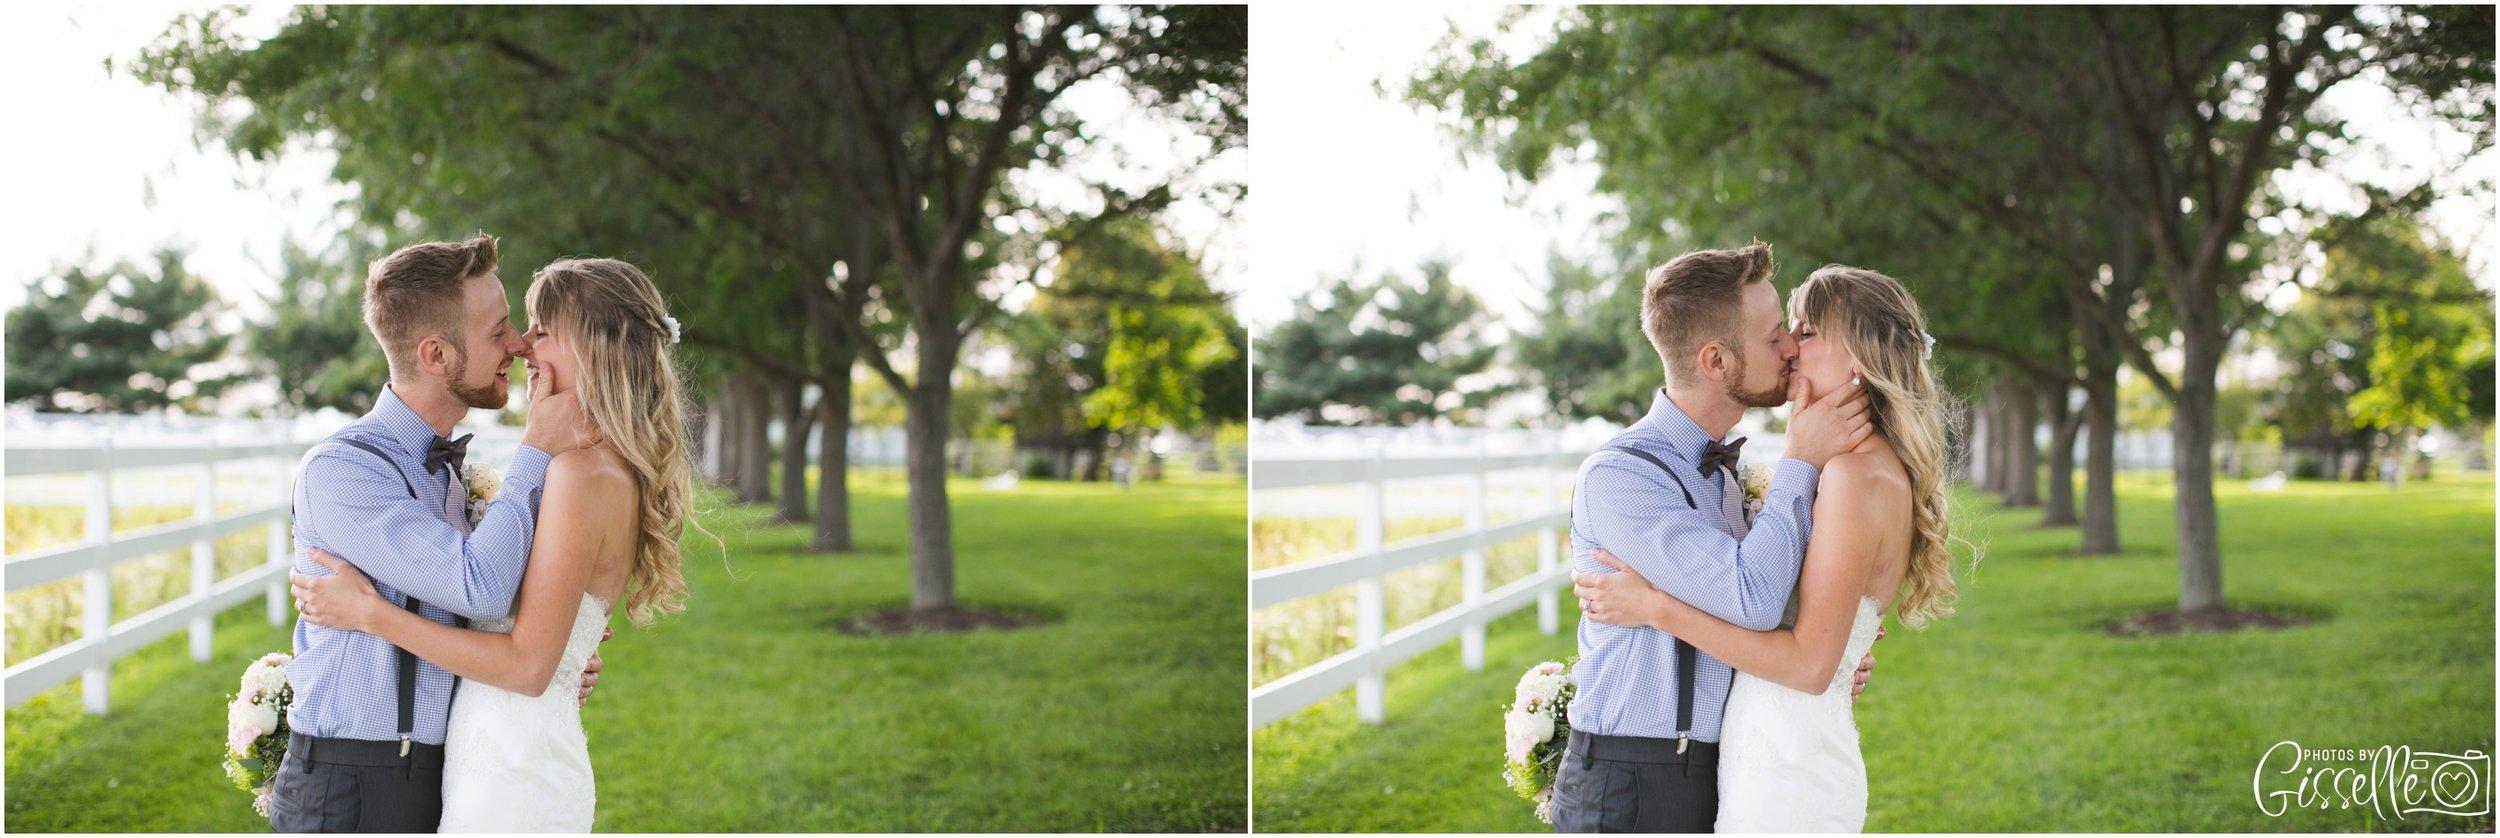 Northfork Farm Wedding_0407.jpg